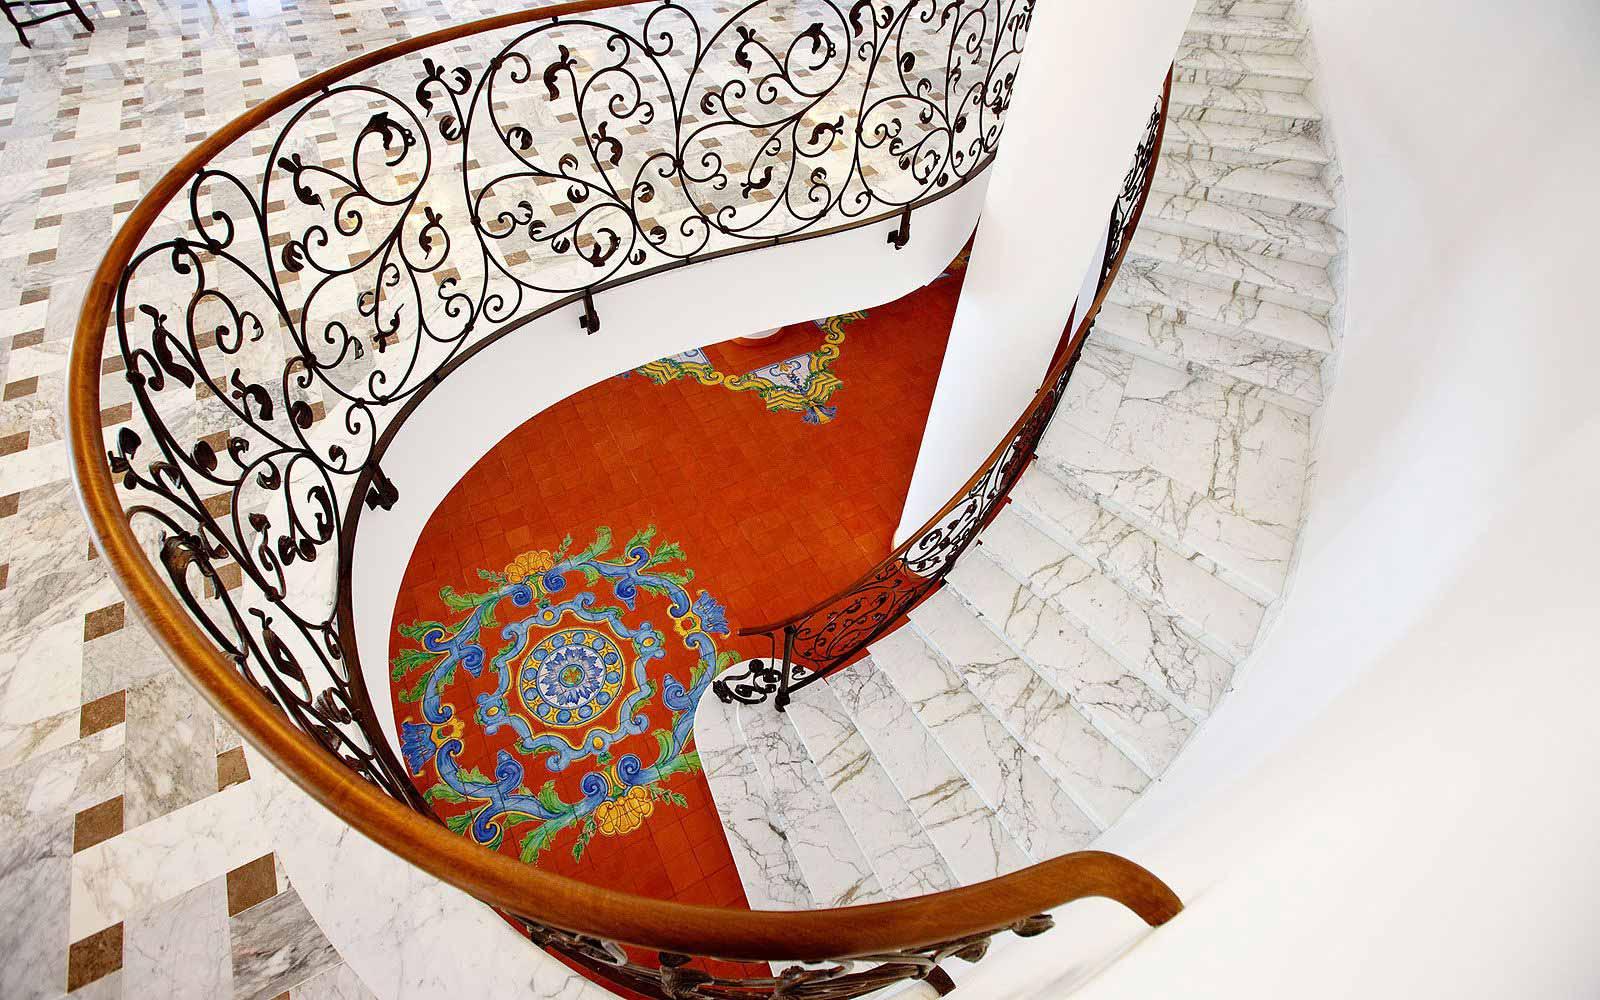 Internal staircase at the Grand Hotel La Favorita